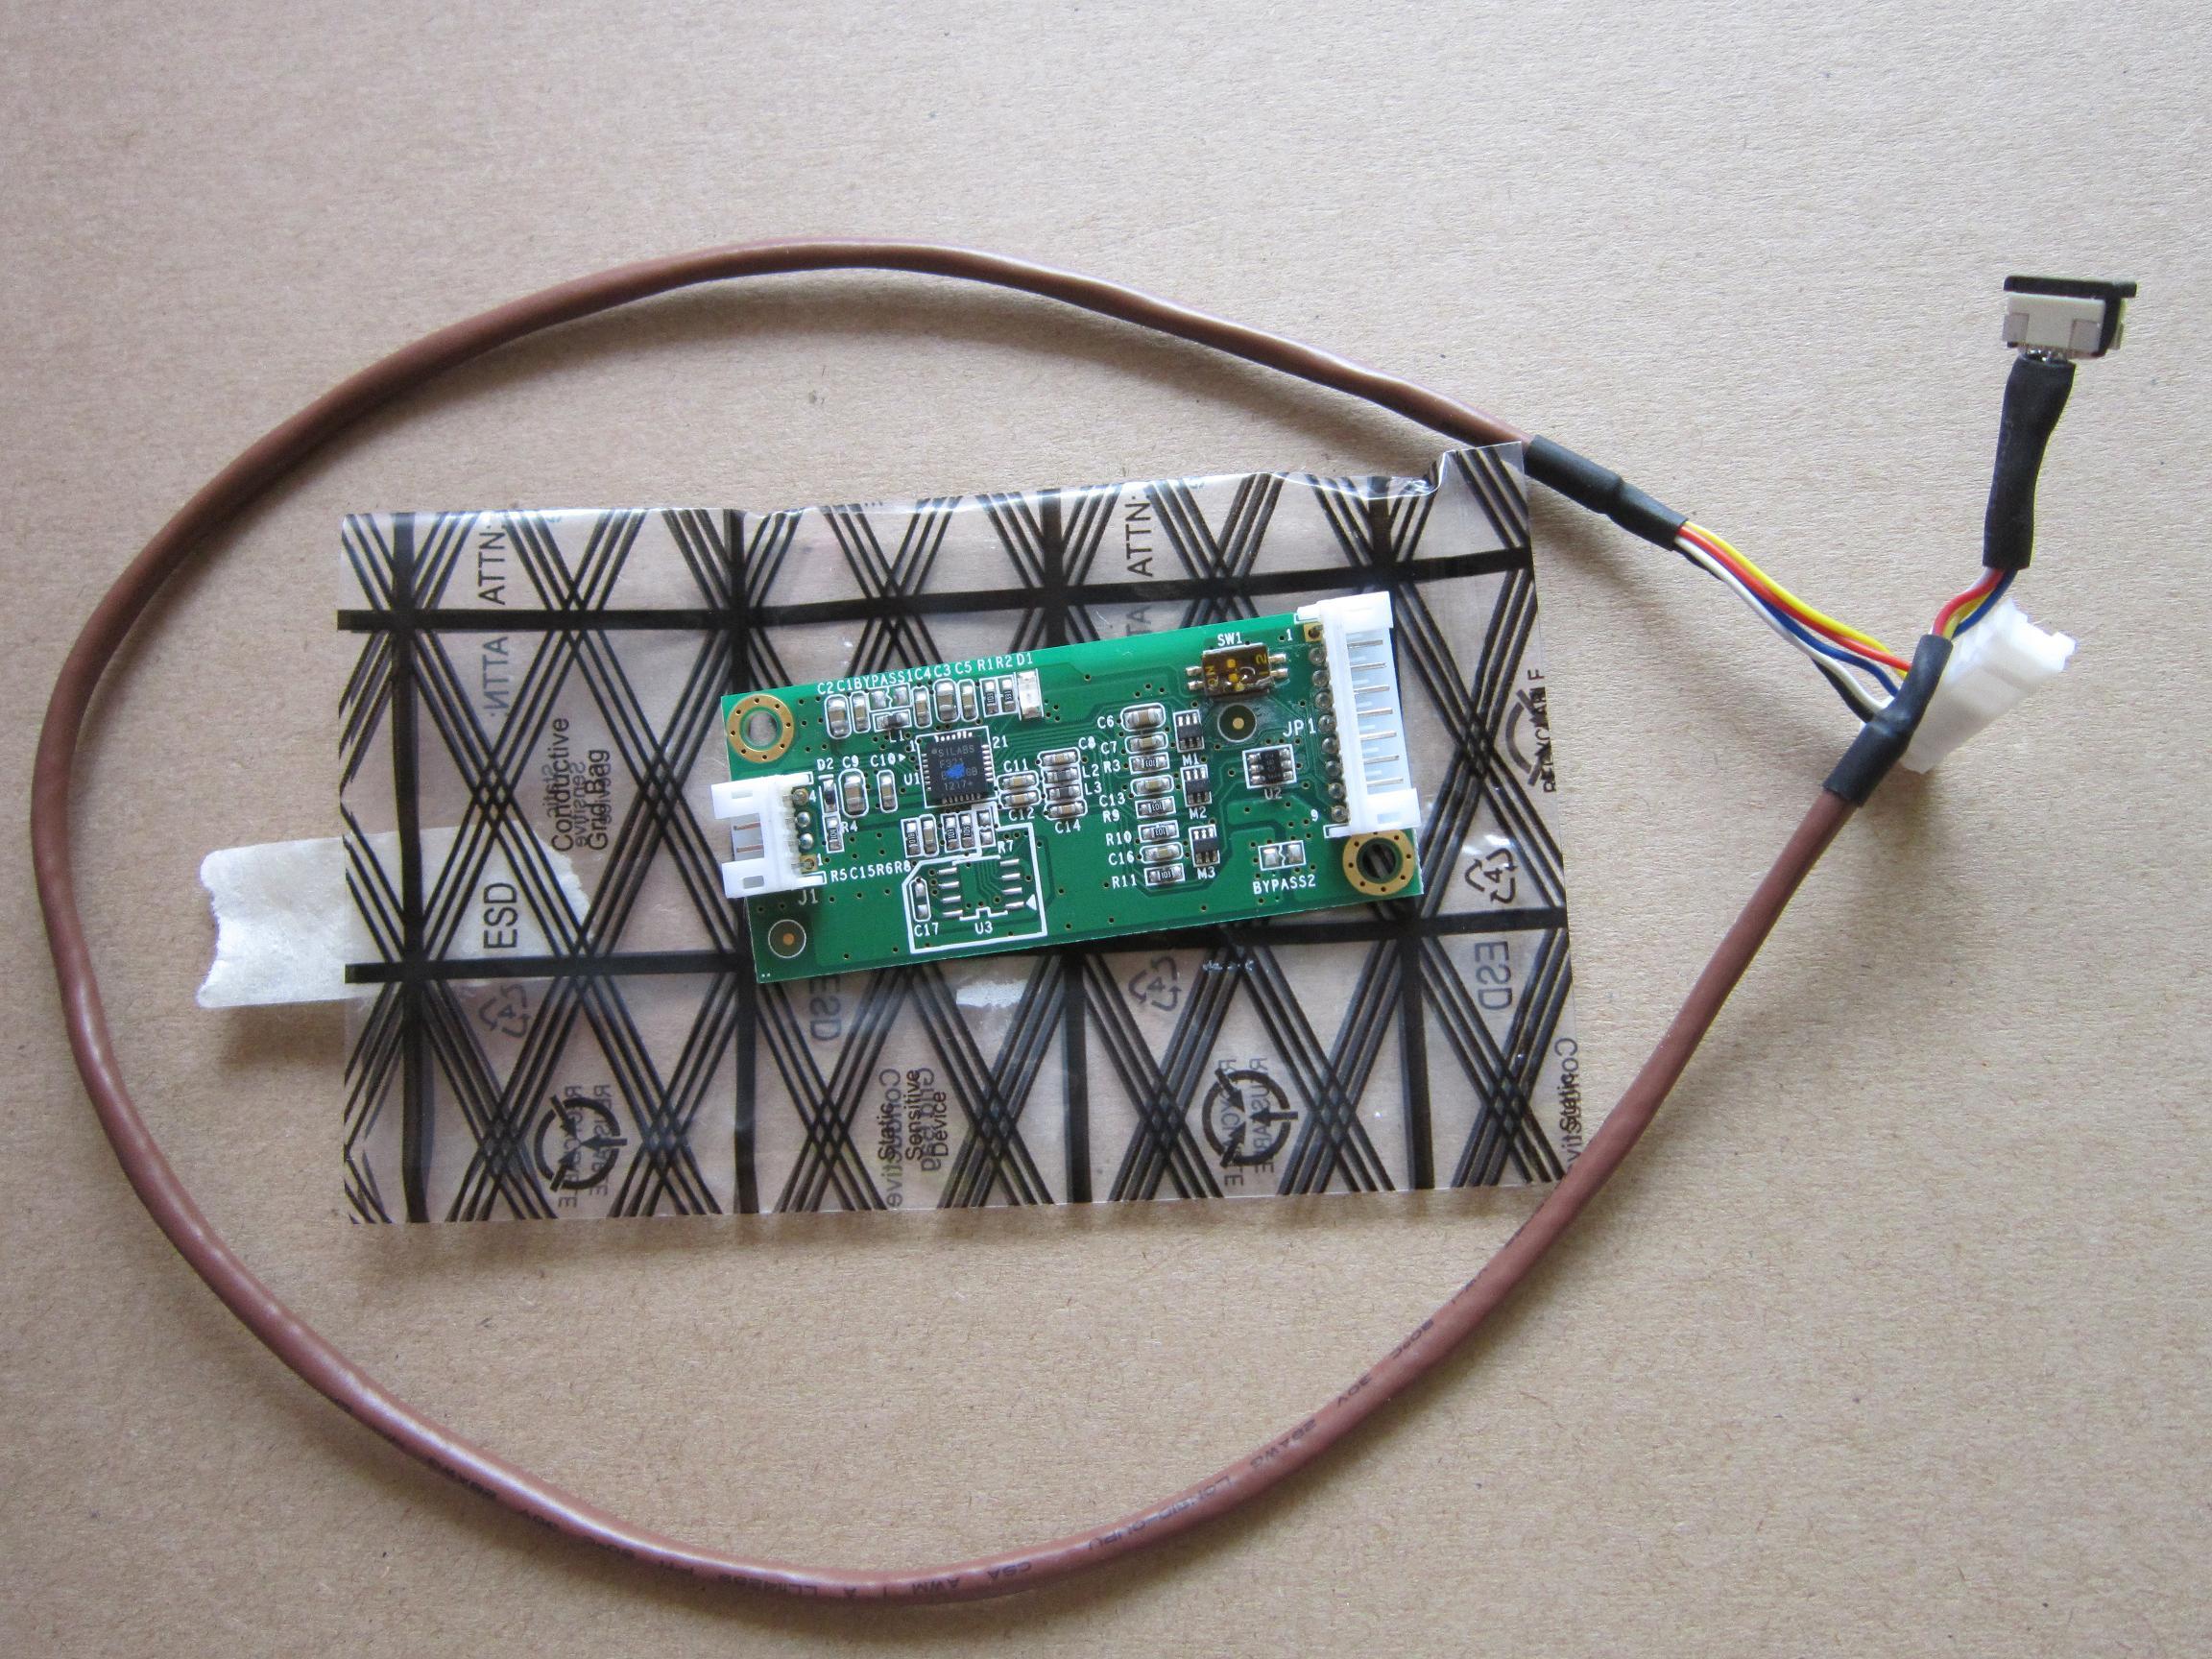 PM6300 penMount PENMOUNT controller Taiwan original complimentary USB cable